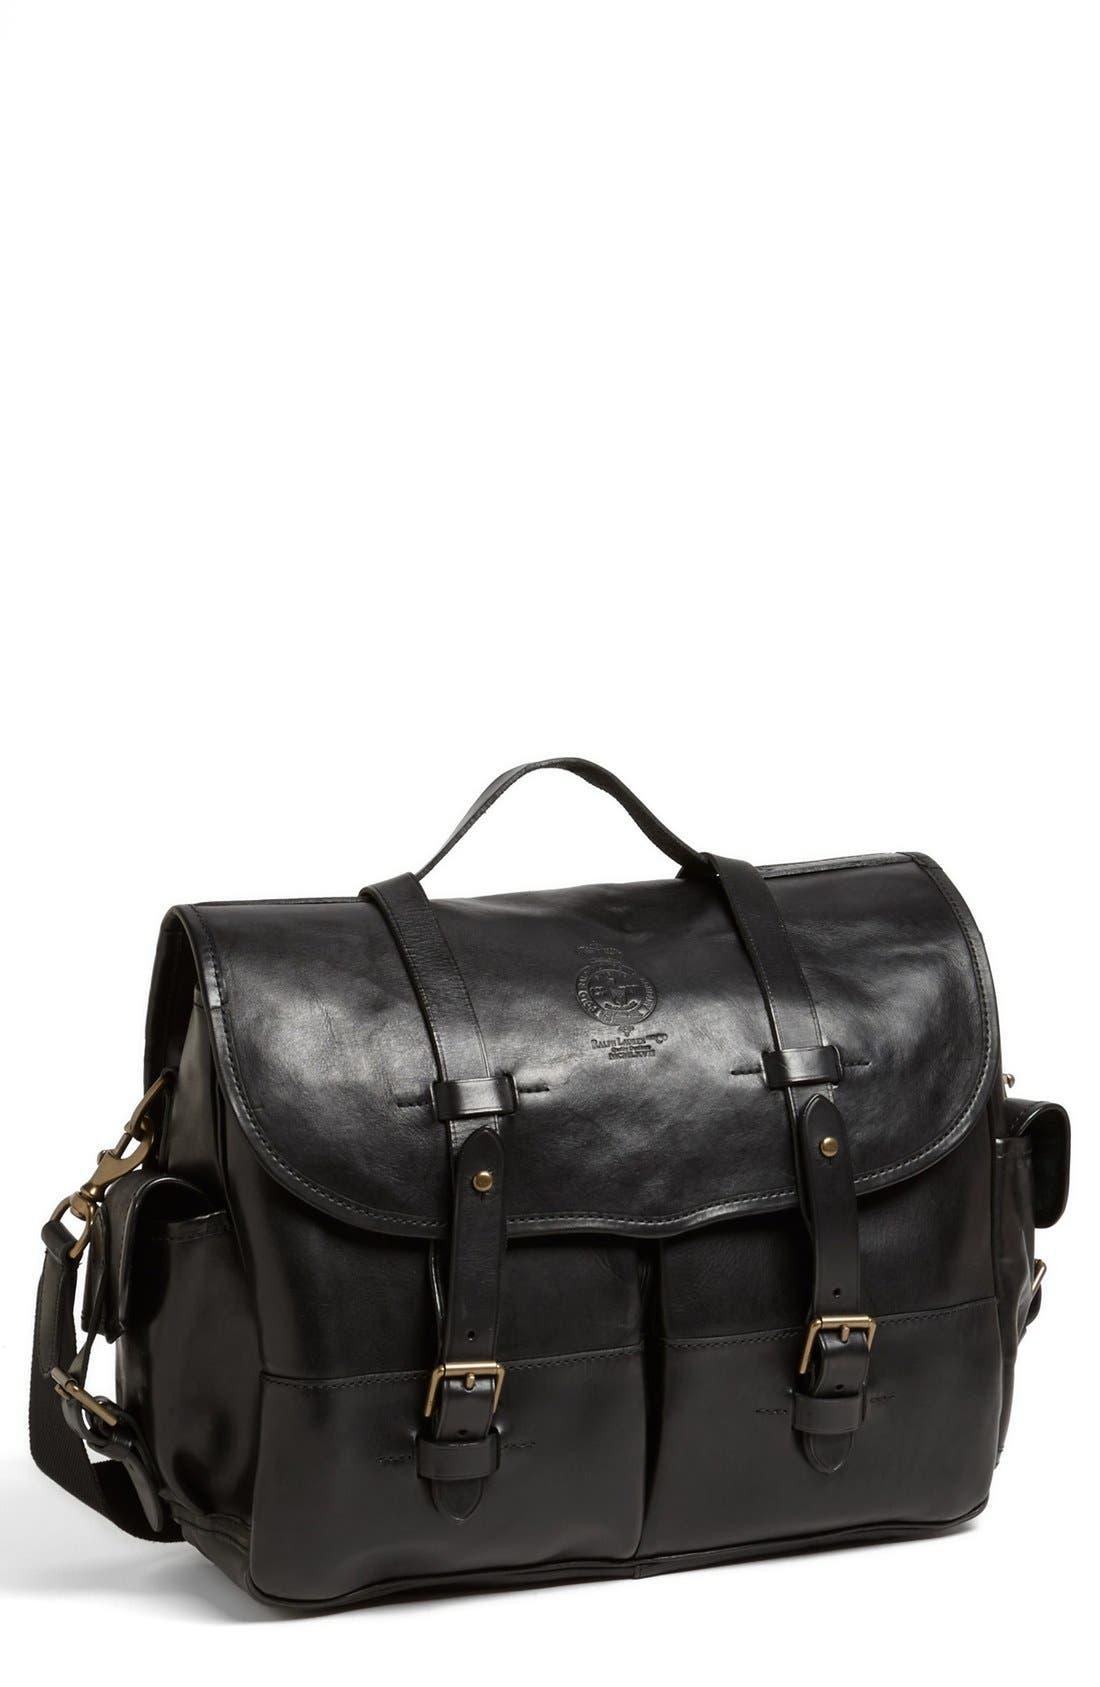 POLO RALPH LAUREN, Leather Briefcase, Main thumbnail 1, color, 001